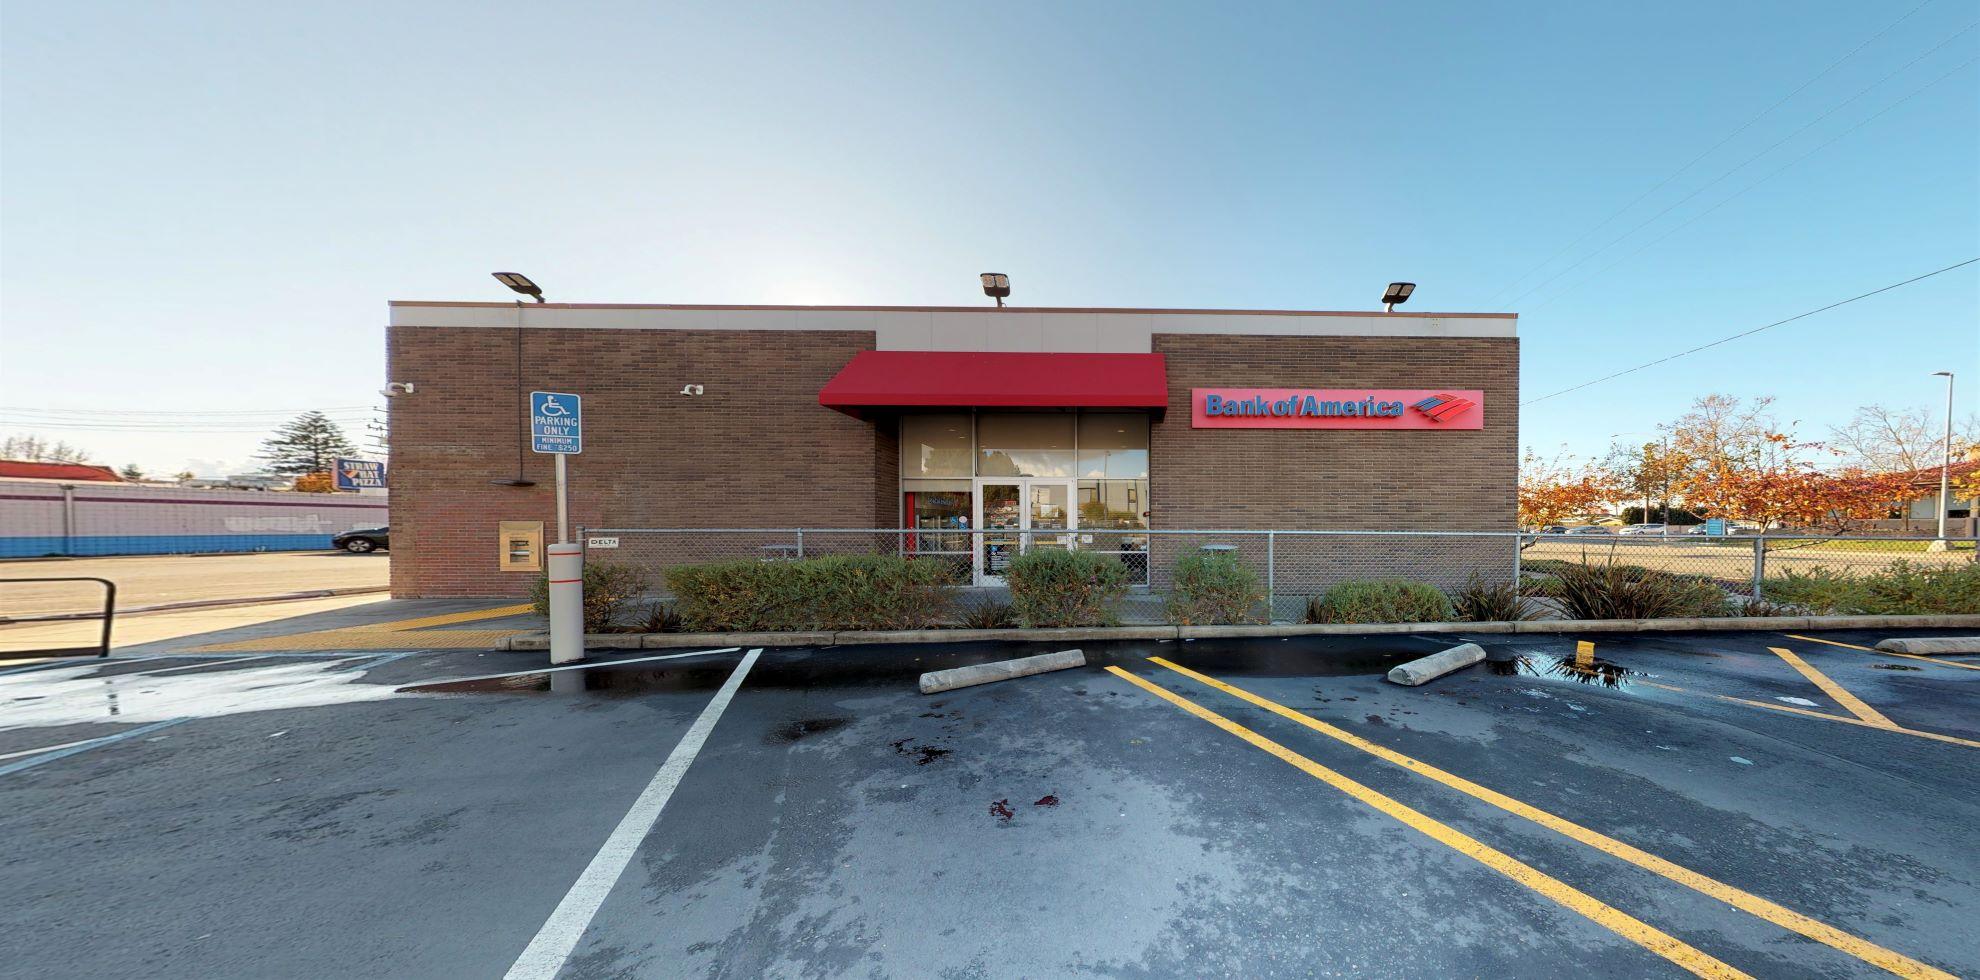 Bank of America financial center with walk-up ATM   24700 Hesperian Blvd, Hayward, CA 94545